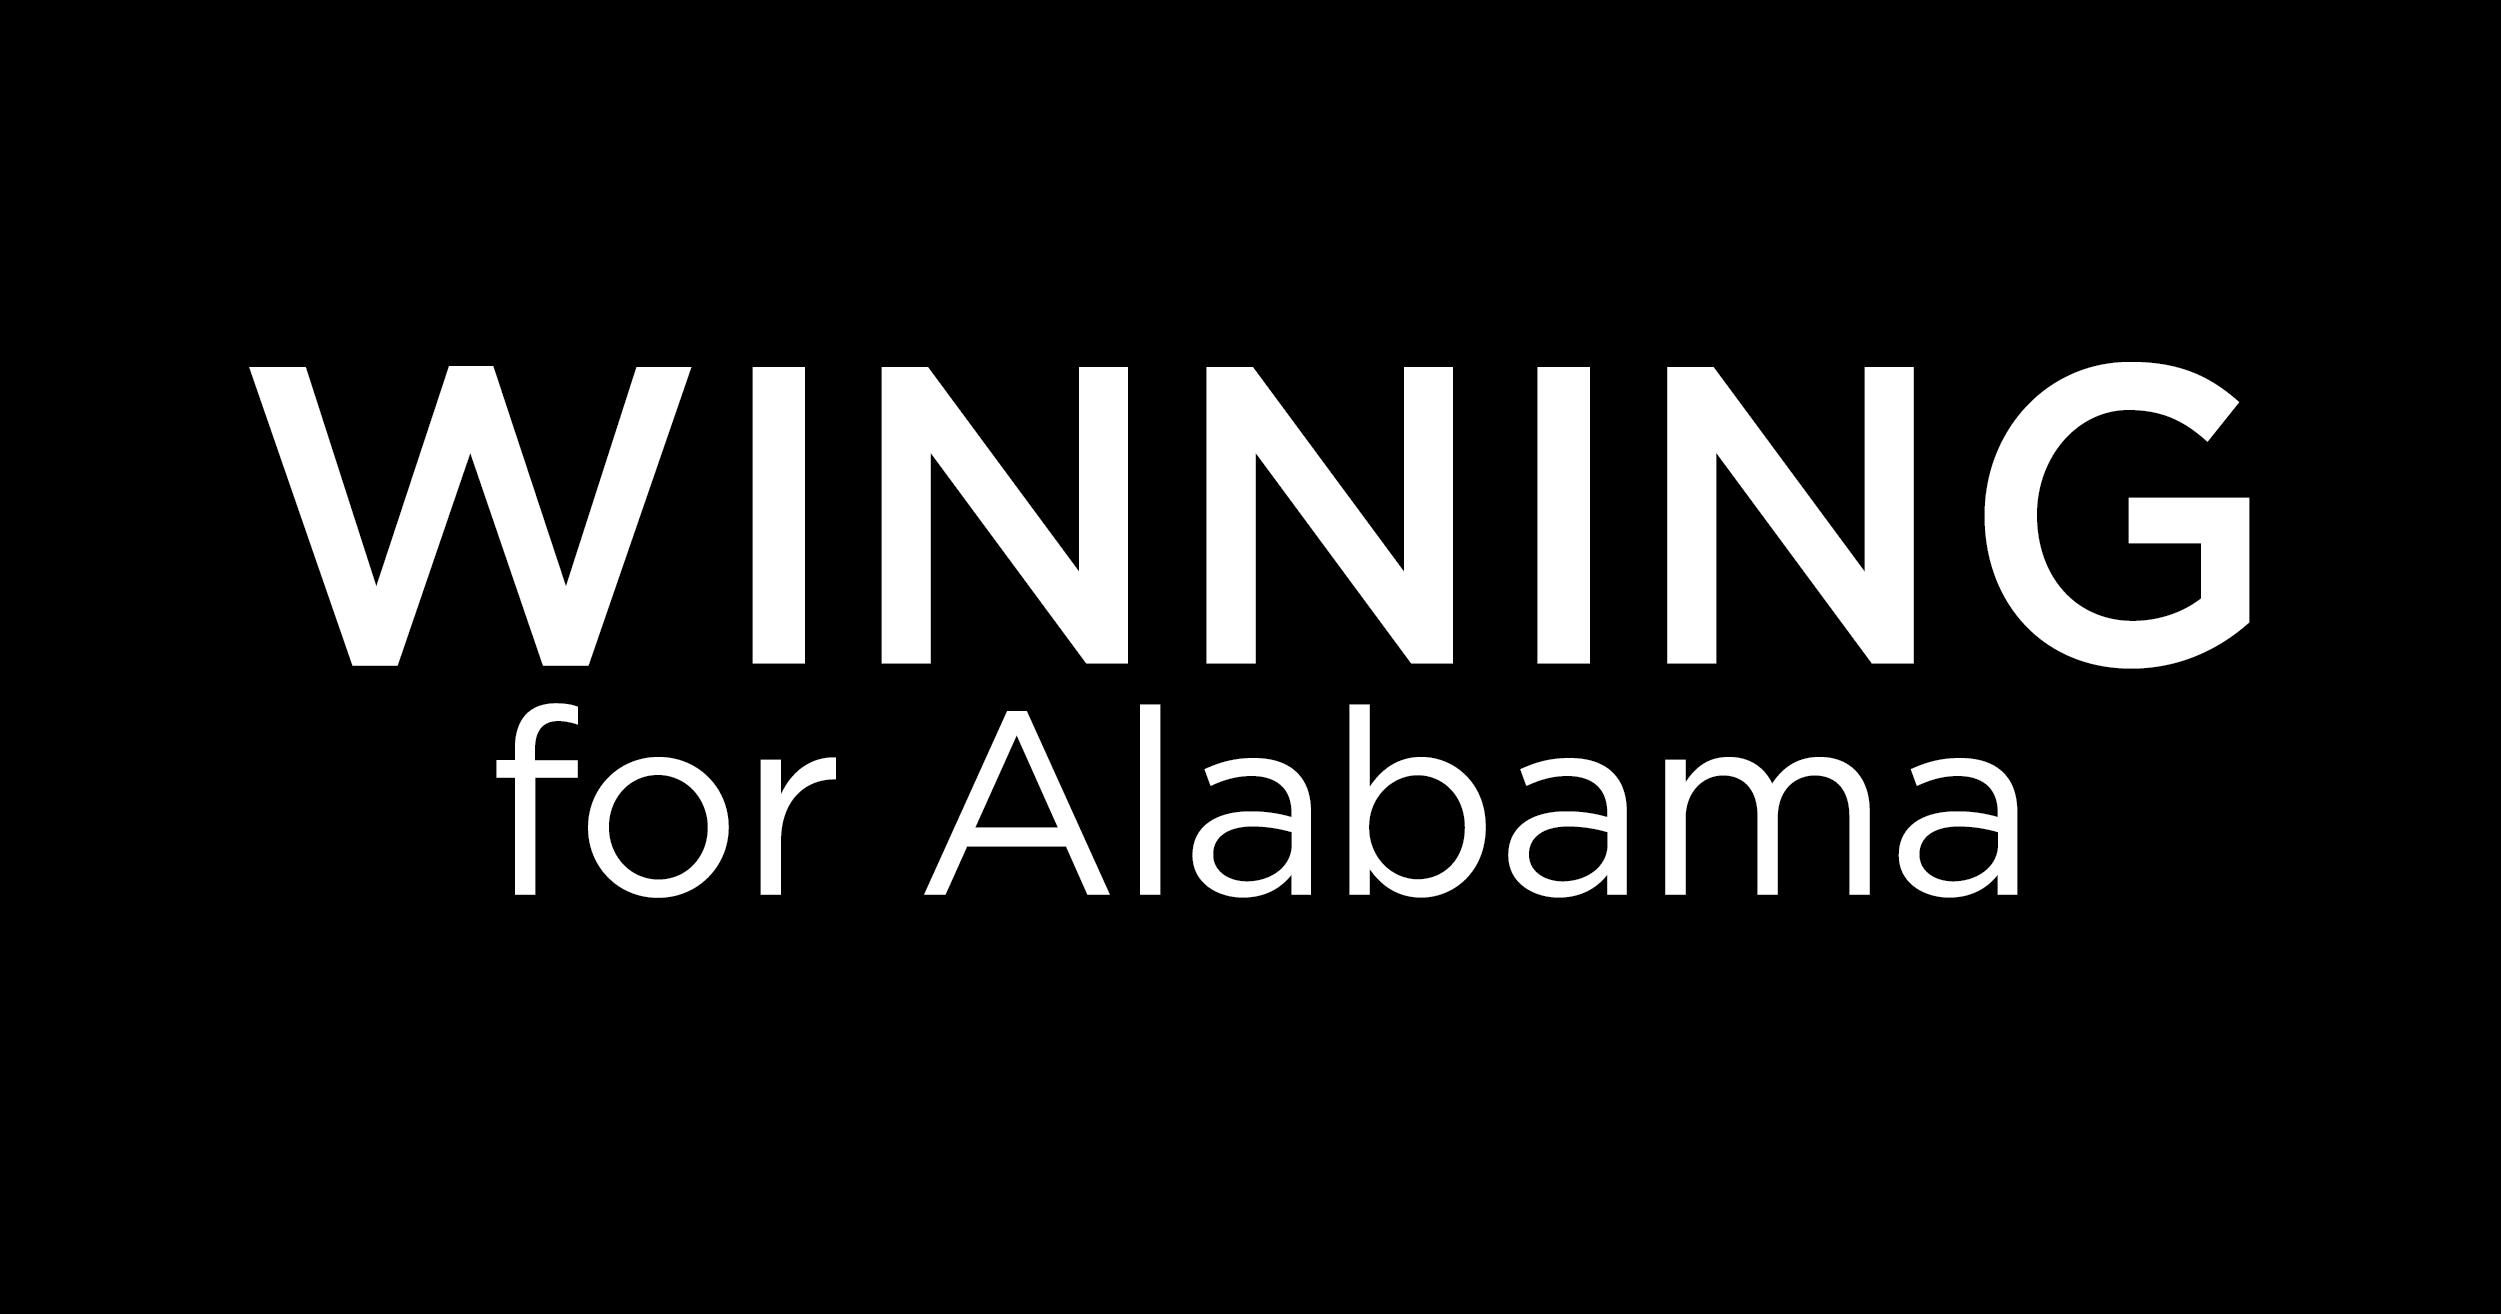 Winning for Alabama